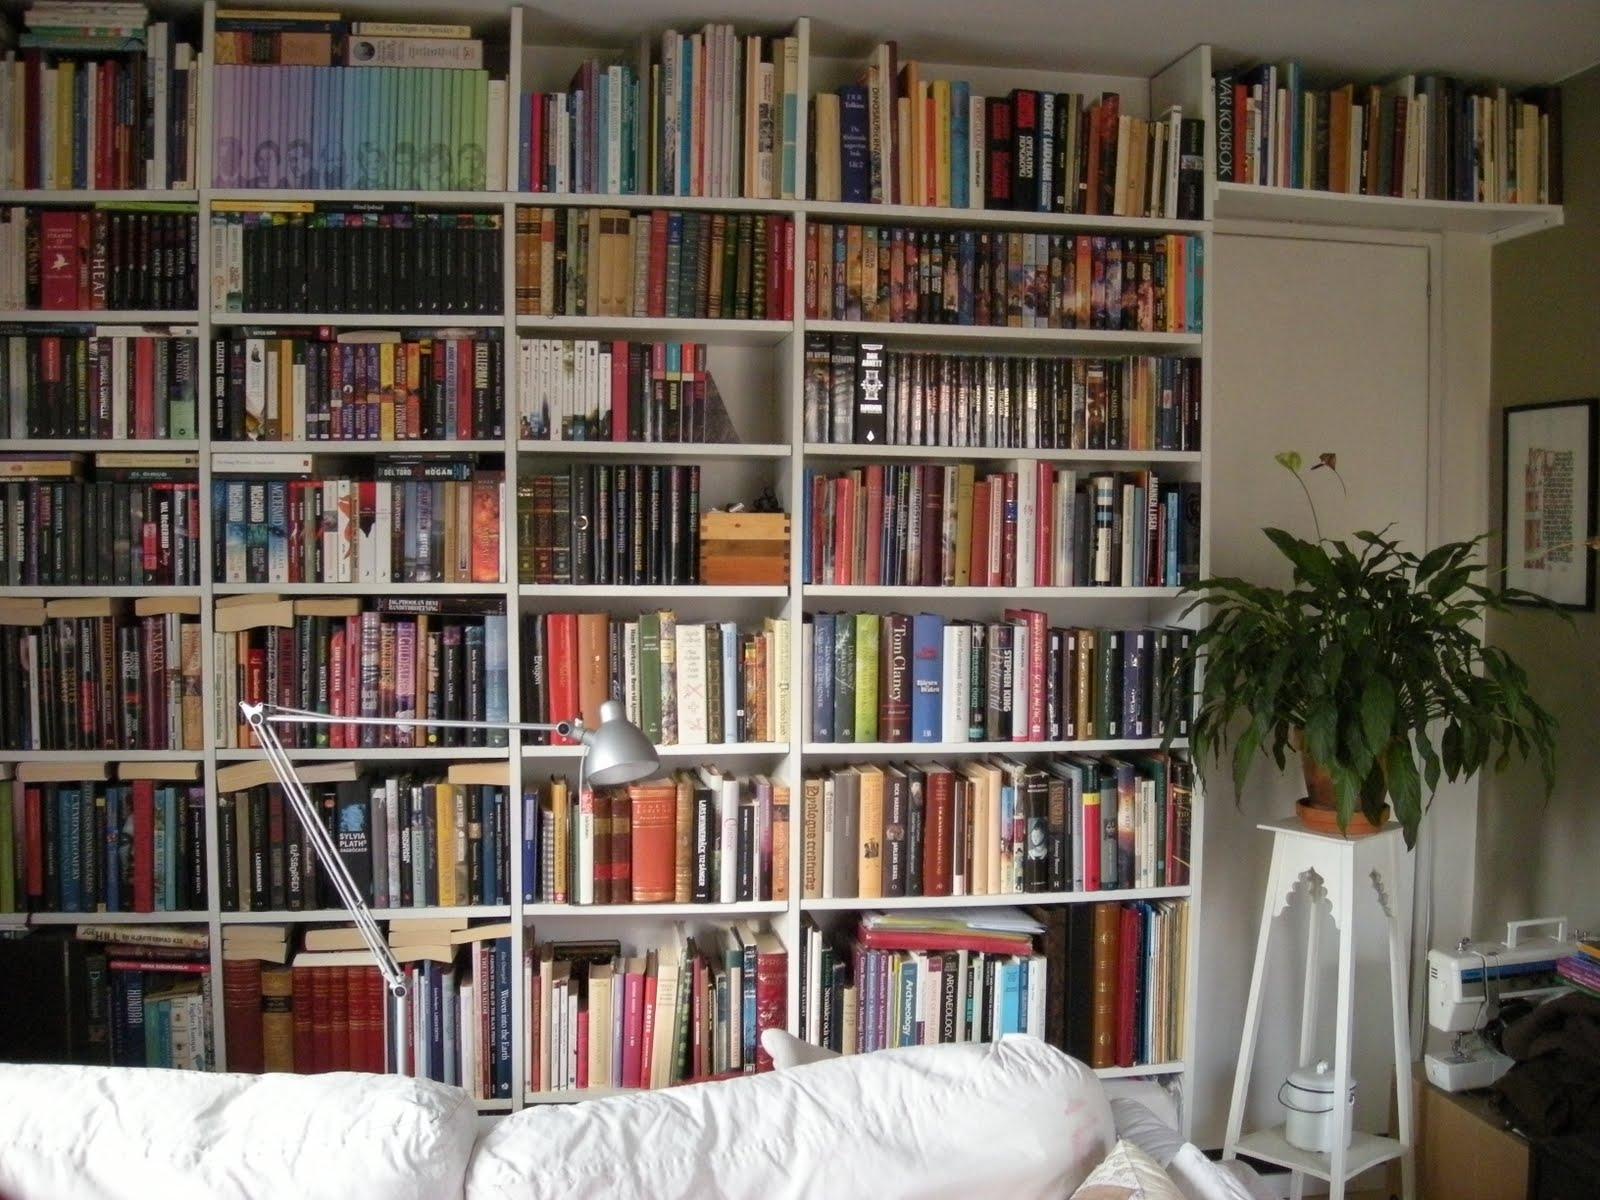 ideas of custom made bookshelf - custom made bookshelf wall ikea hackers ikea hackers with regard to custommade bookshelf (